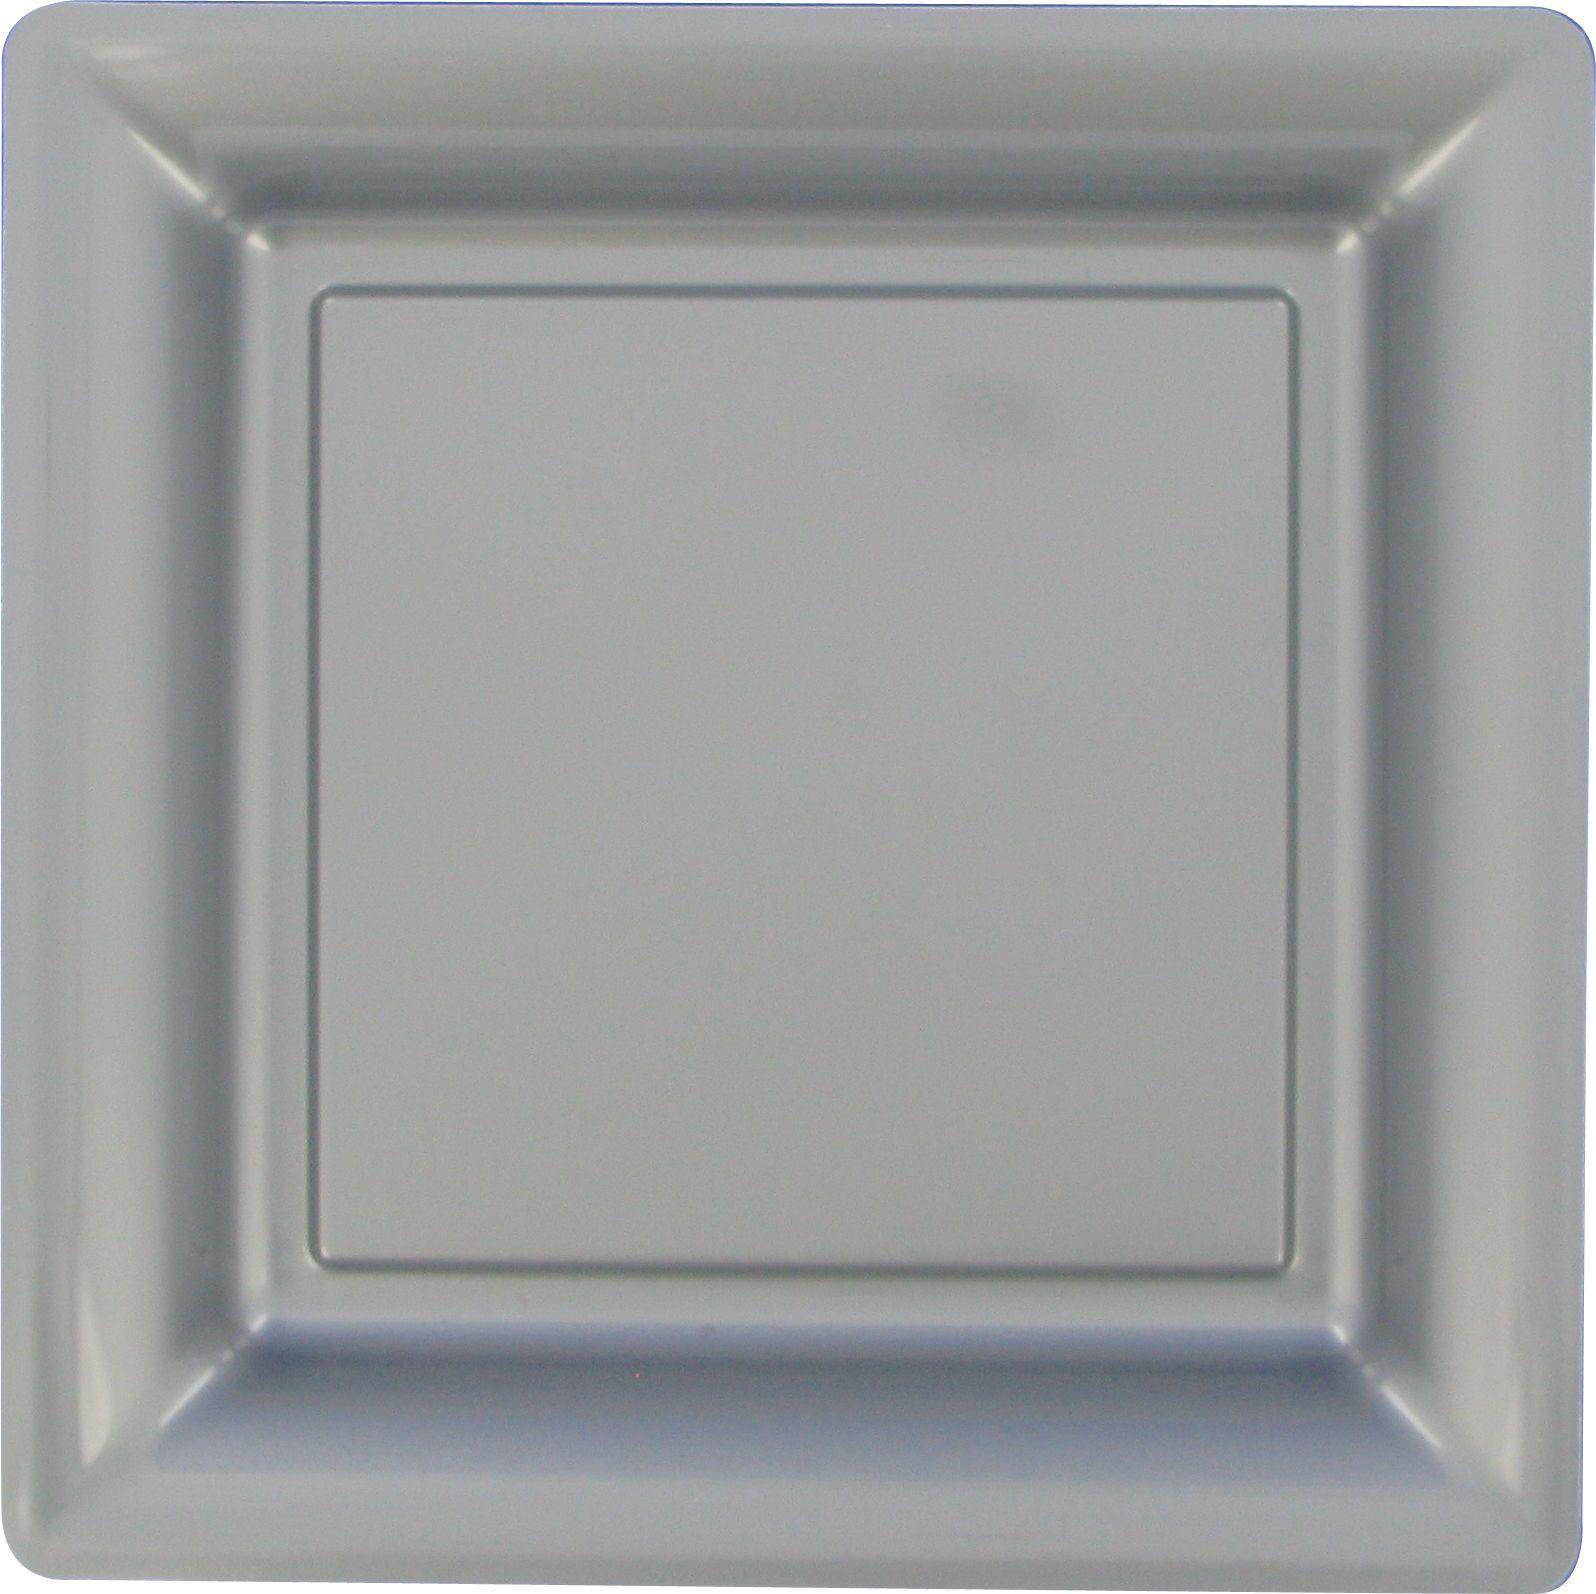 assiettes carr es articles de f te vaisselles jetables le. Black Bedroom Furniture Sets. Home Design Ideas